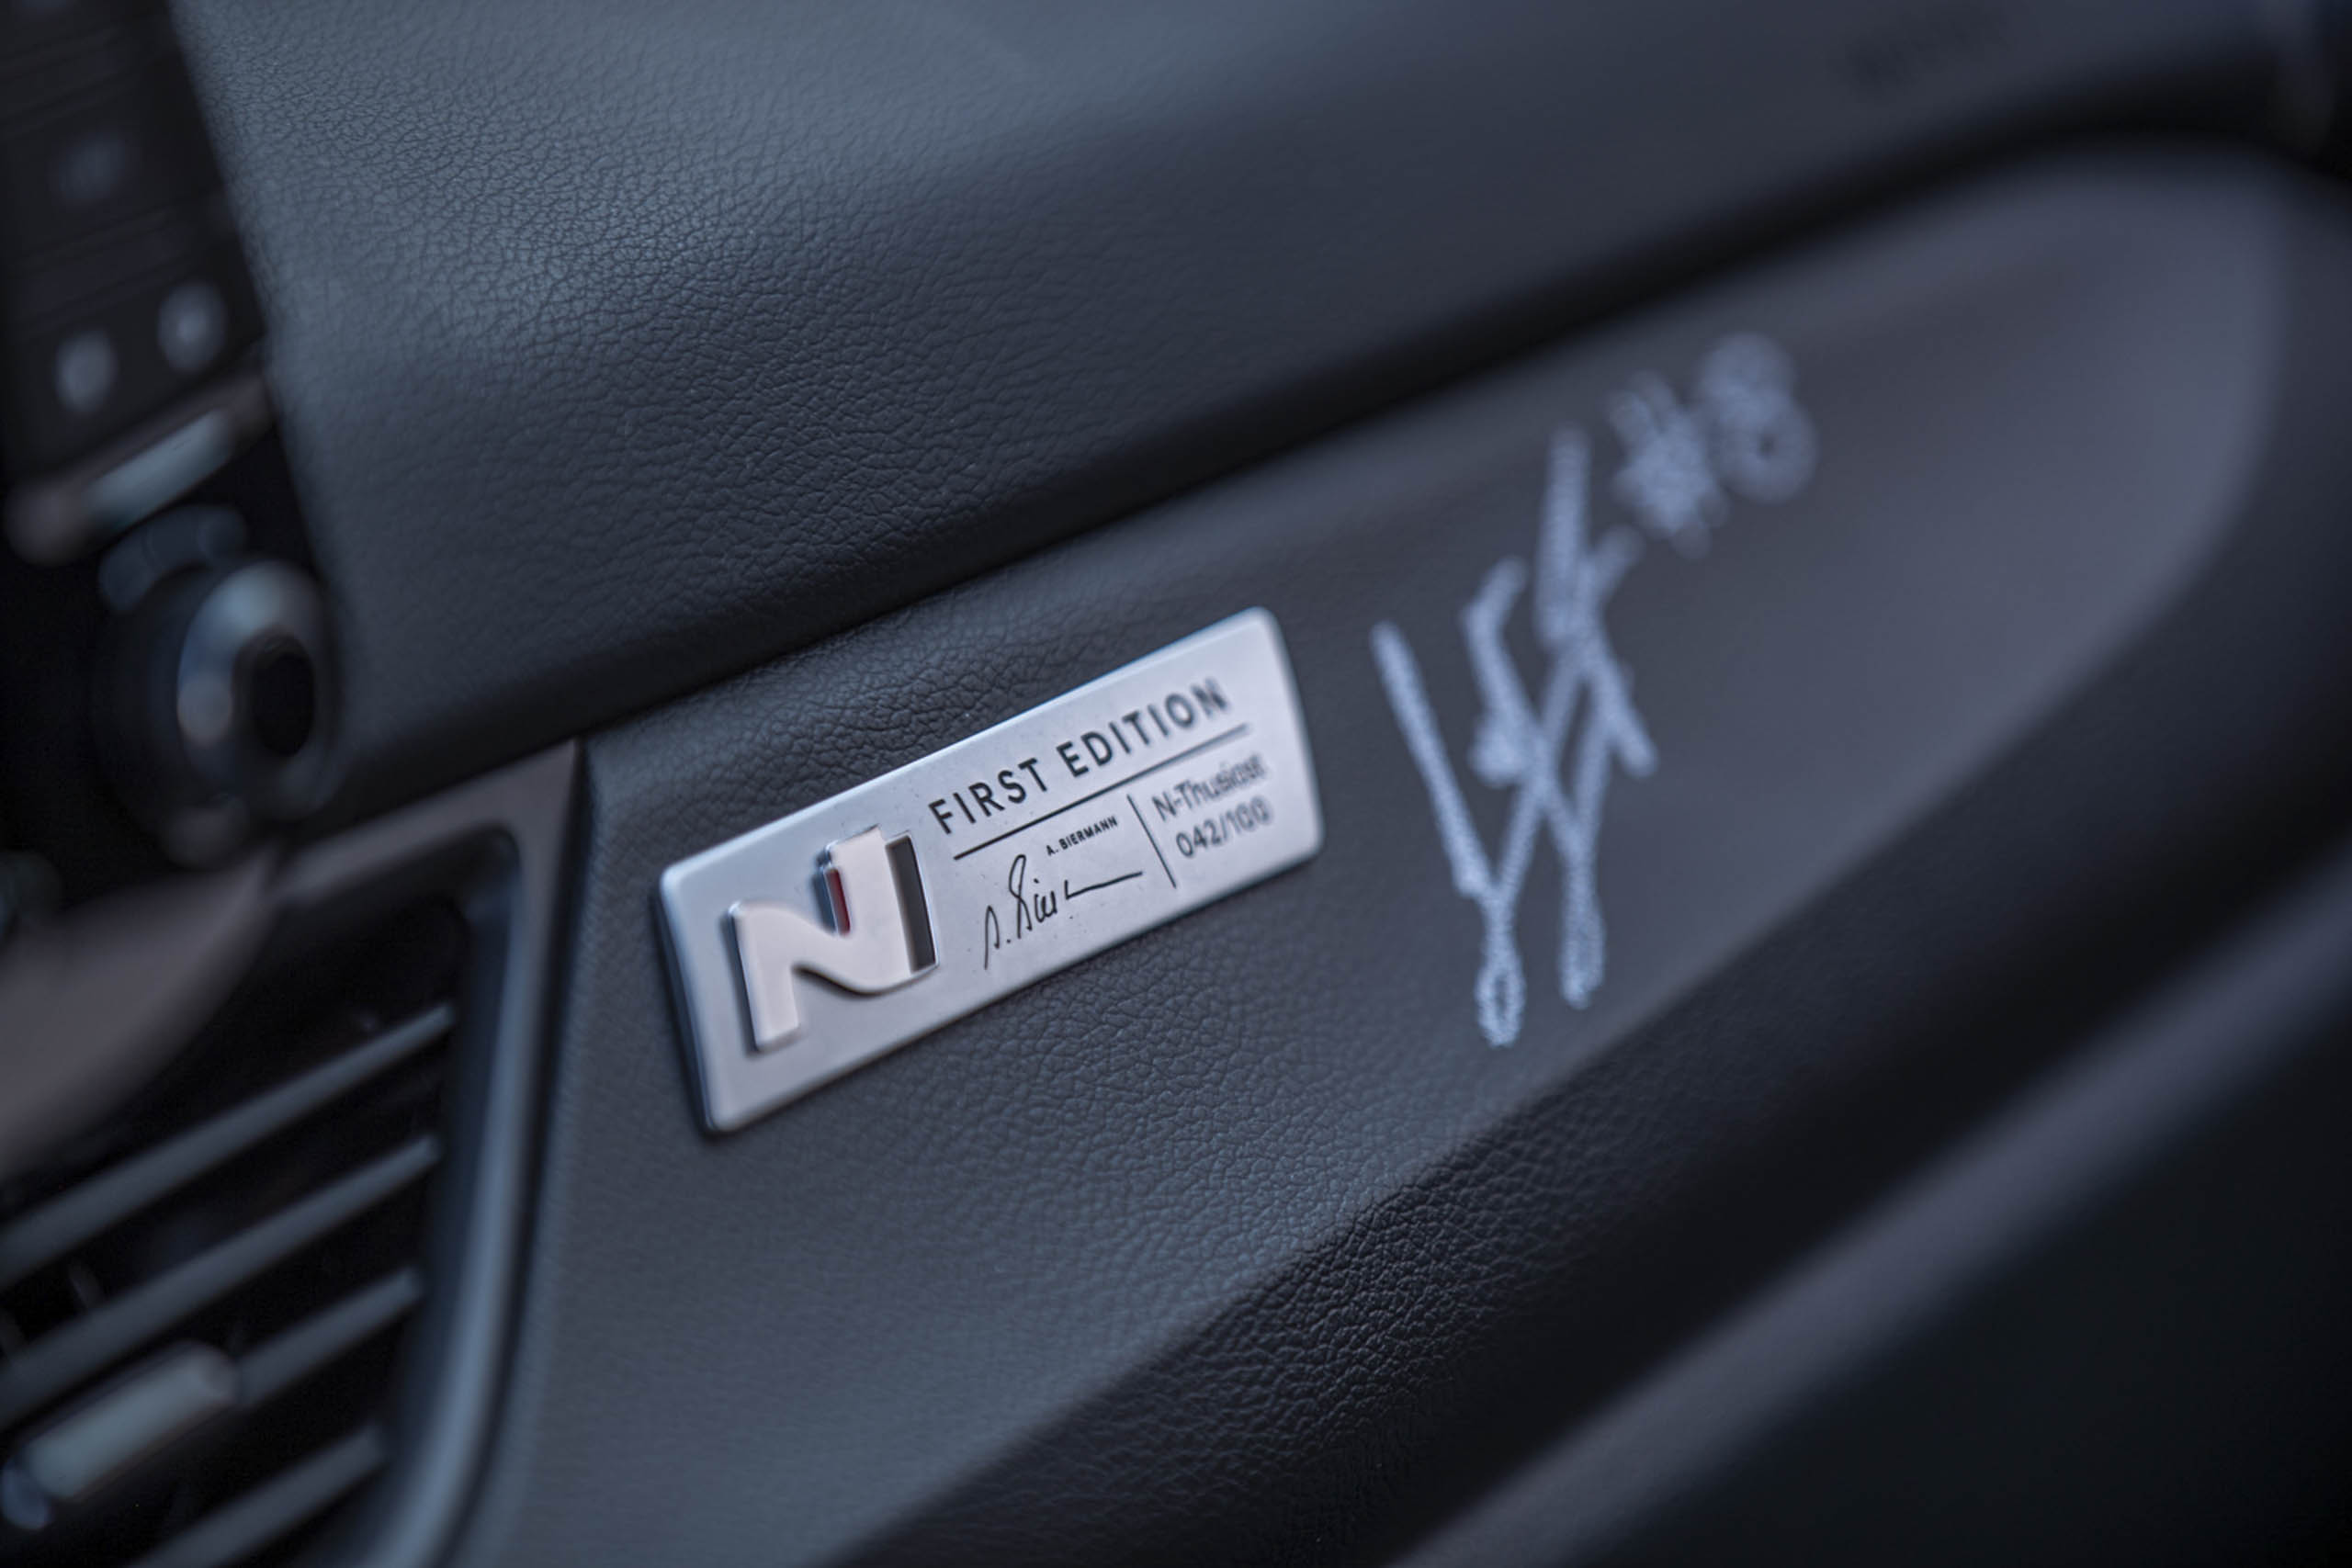 N First Edition Hyundai